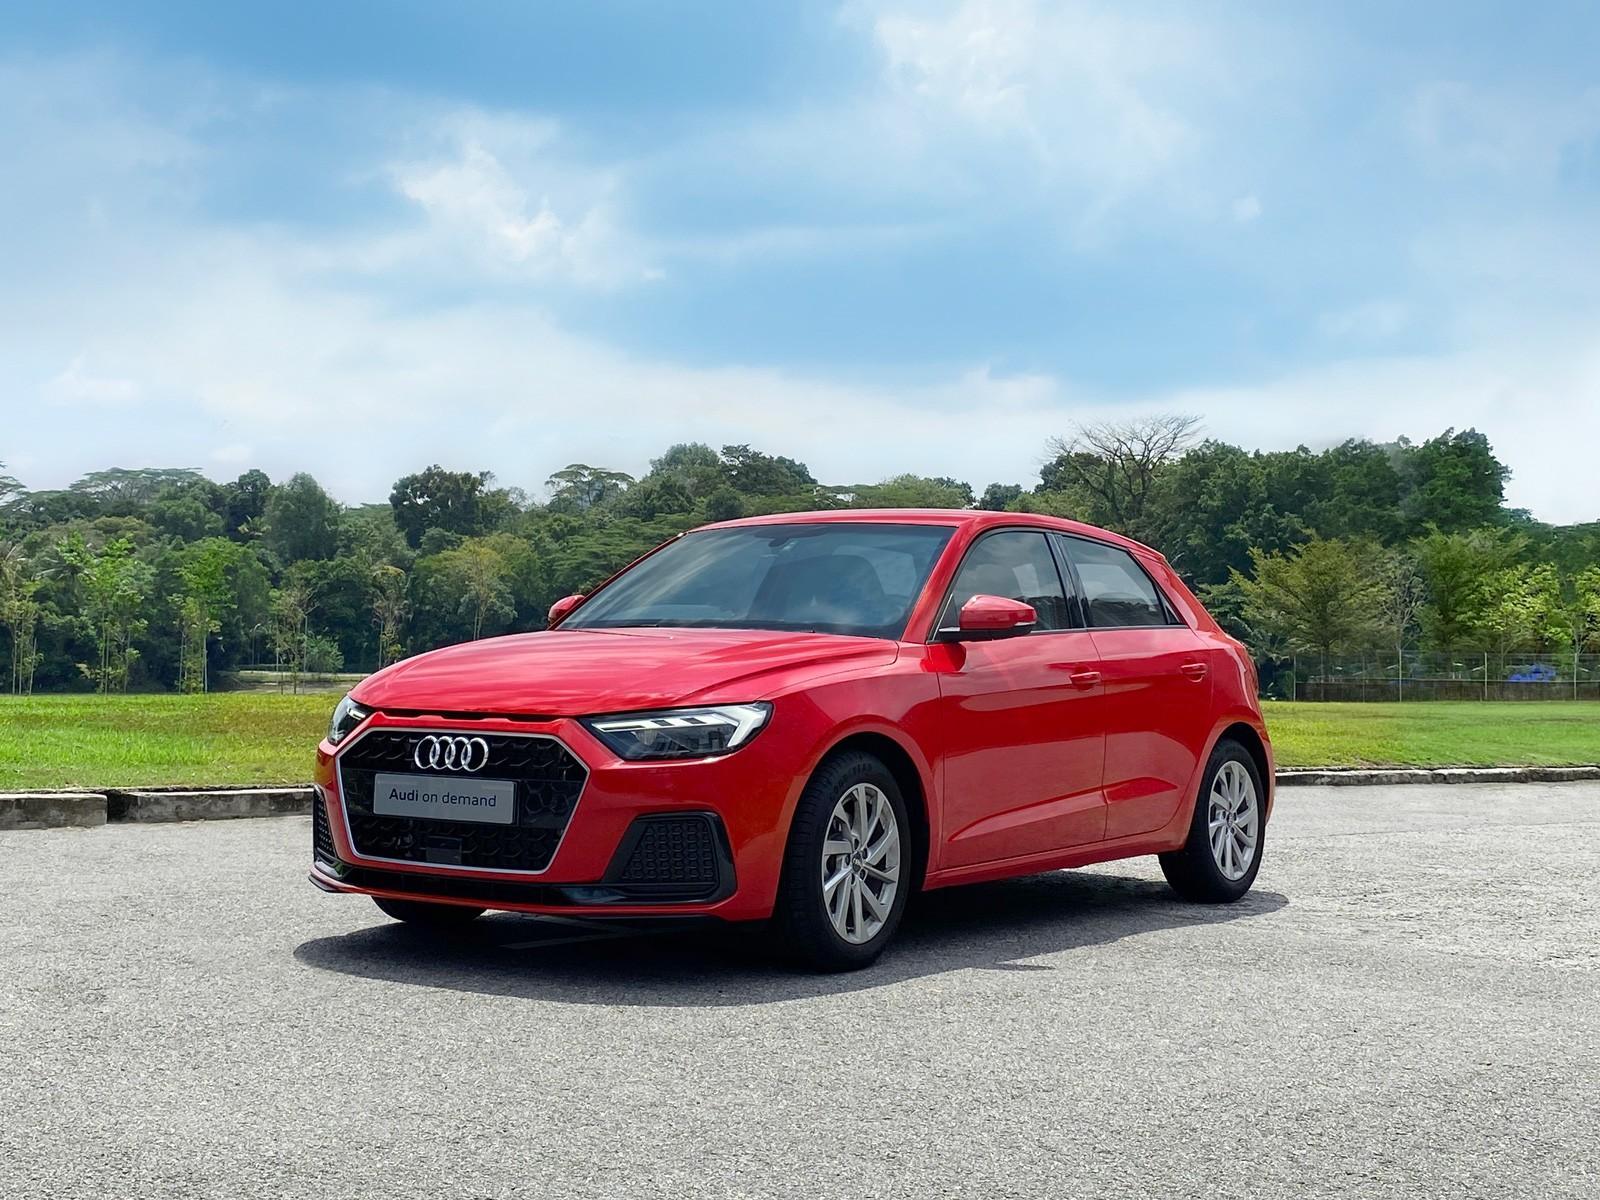 Audi A1 Sportback Advanced 1.0 TFSI S Tronic (For Rent)